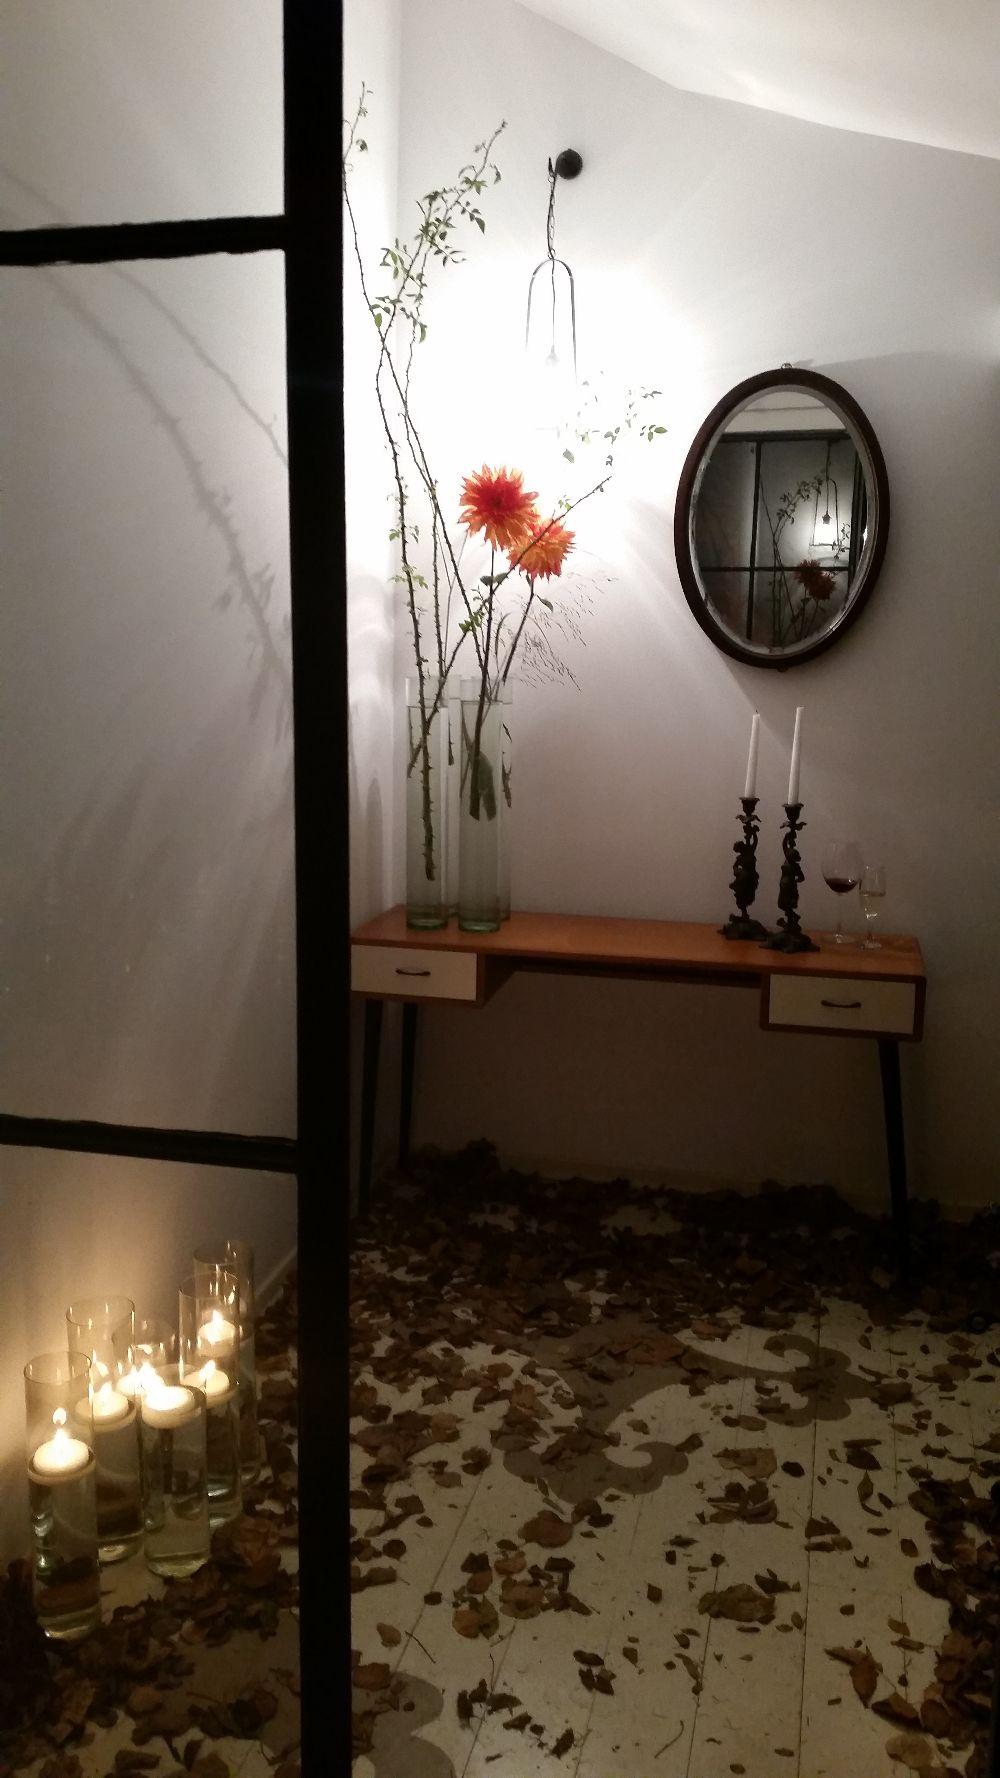 adelaparvu.com despre 45 de ani aniversare Floraria Iris, design floral Nicu Bocancea (23)